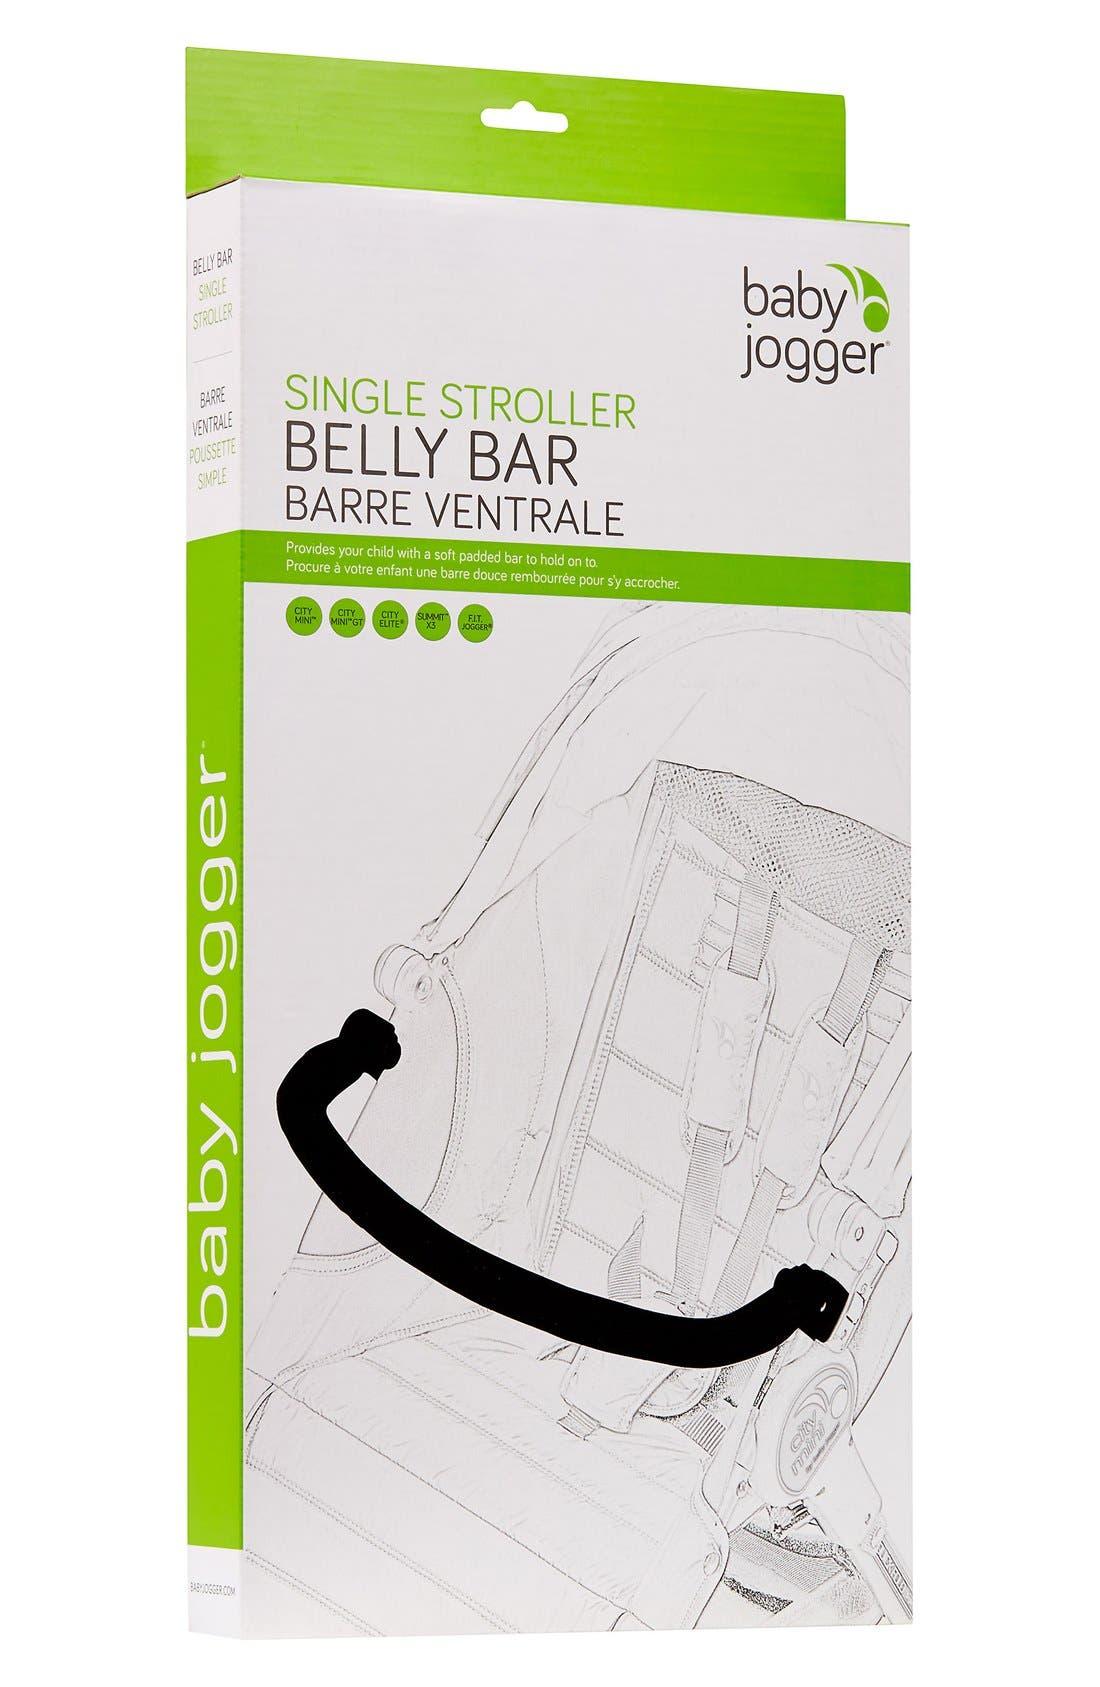 Baby Jogger 'Belly Bar' Padded Stroller Bar